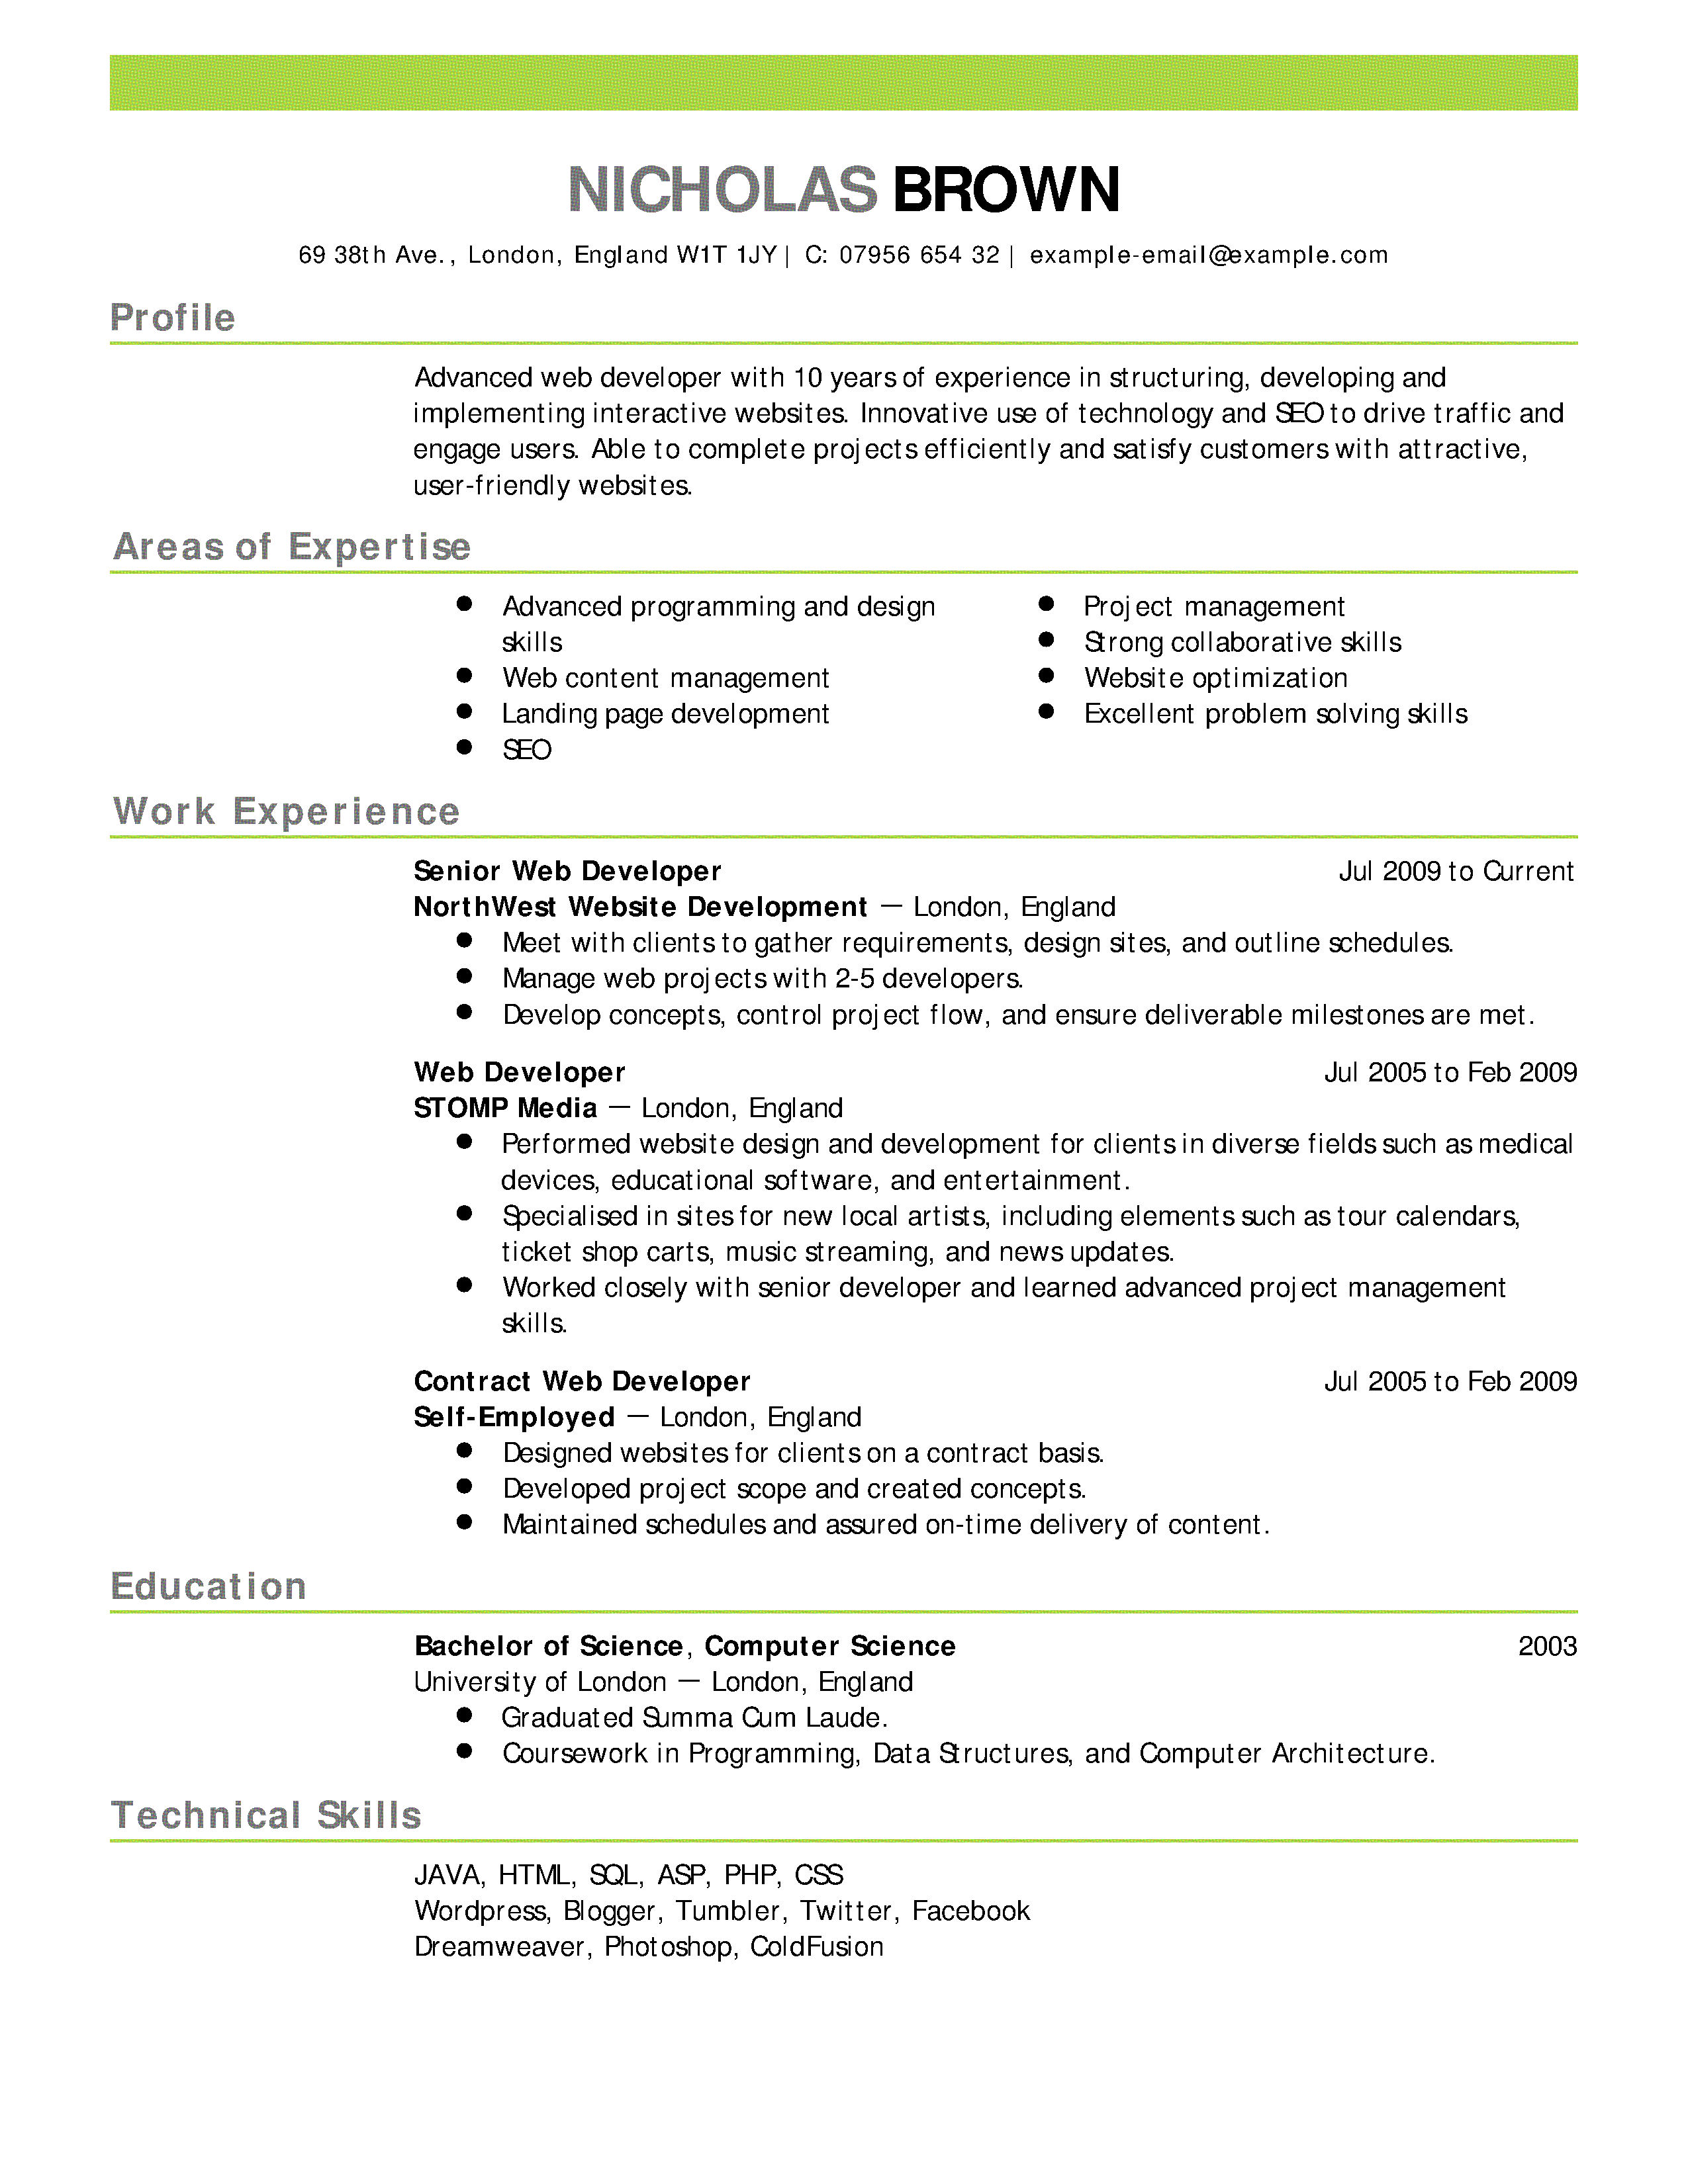 Web Developer Resume Example Emphasis 2 Expanded 2 Png 2550 3300 Teaching Resume Job Resume Examples Resume Skills